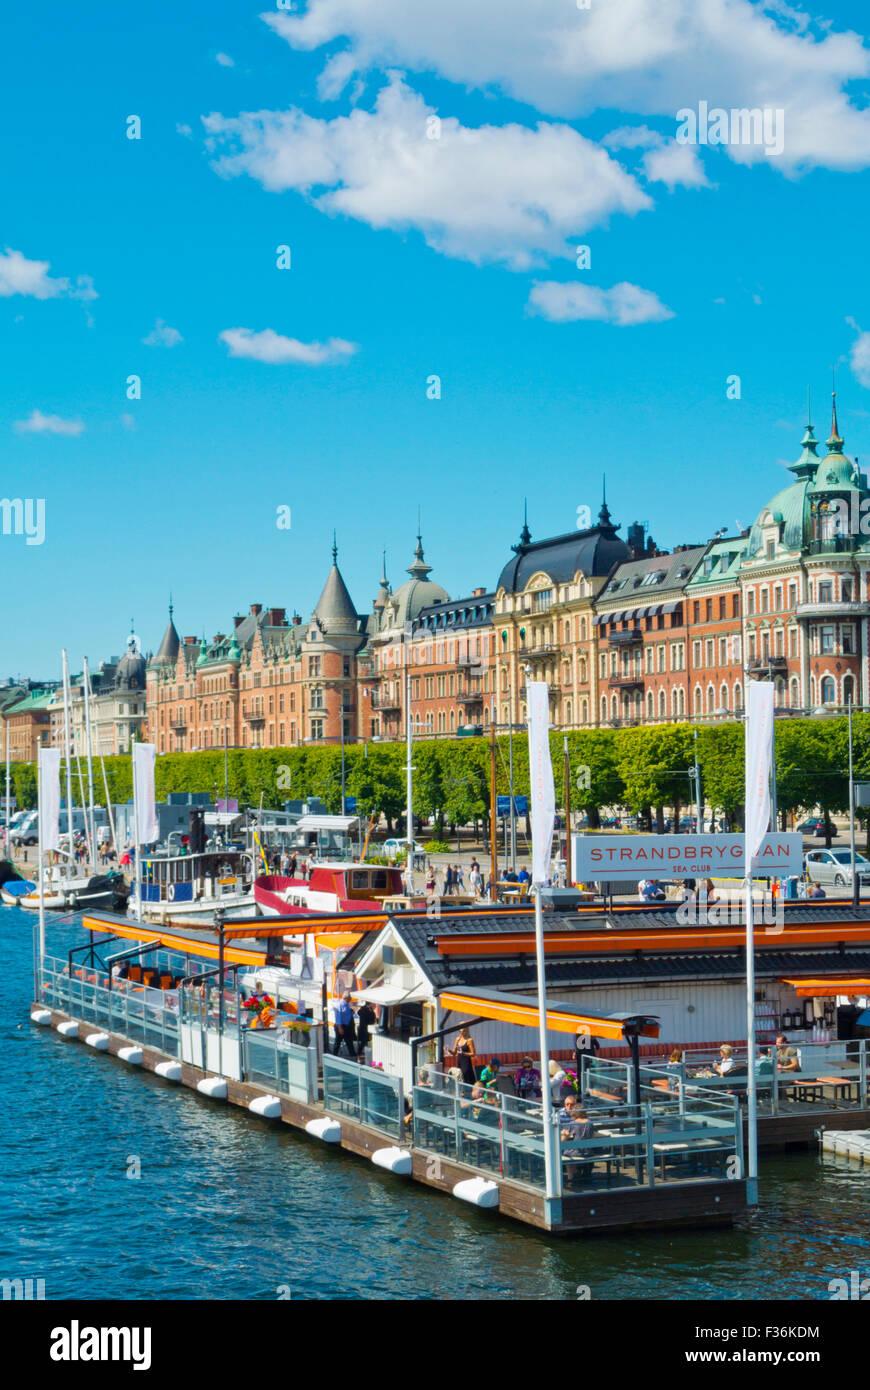 Strandbryggan, cafe e ristorante, Strandvägen, Östermalm, Stoccolma, Svezia Immagini Stock